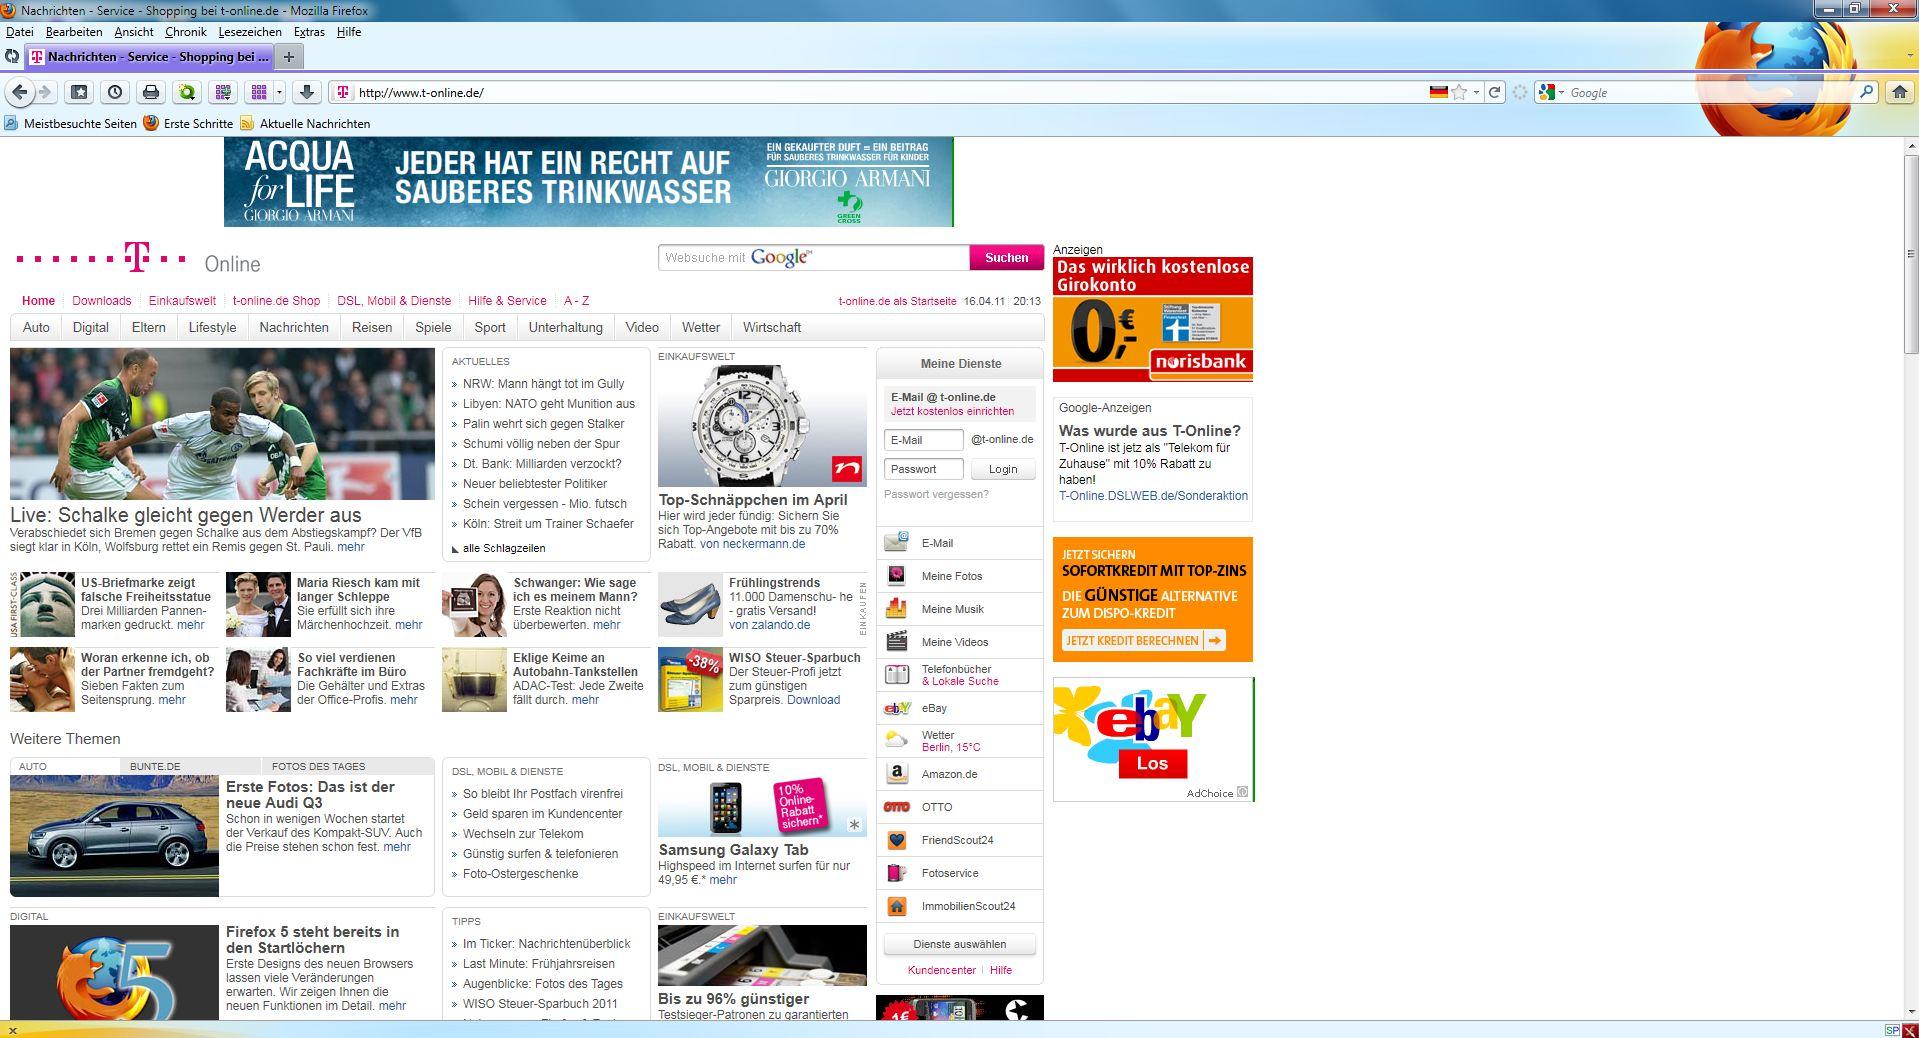 wwwt-online.de kundencenter